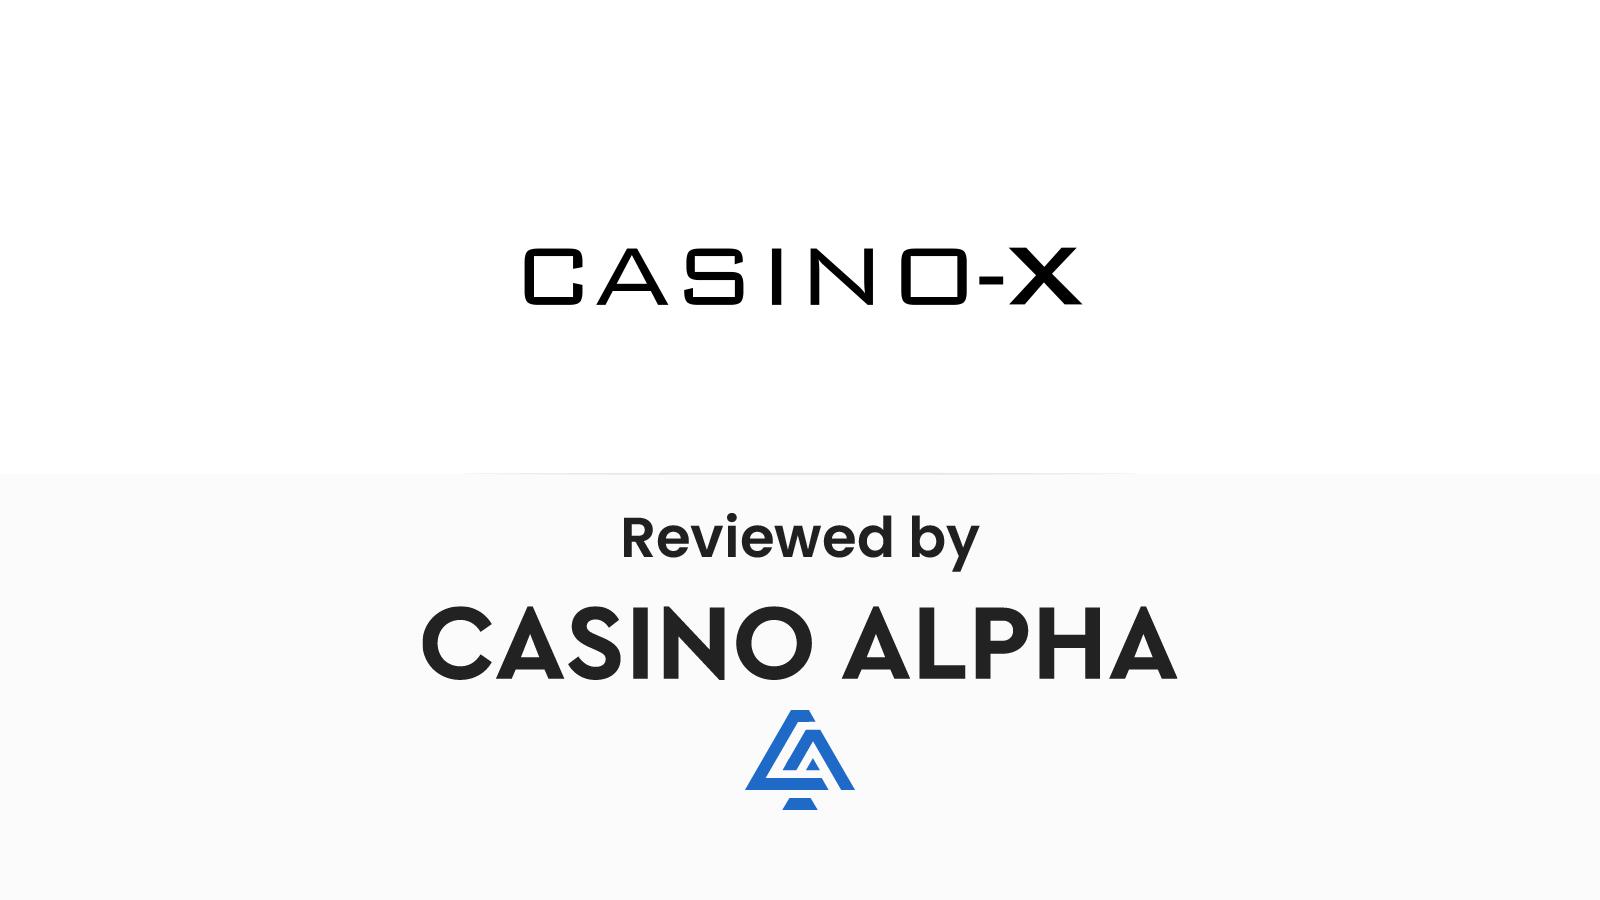 Casino-X Review & Bonuses